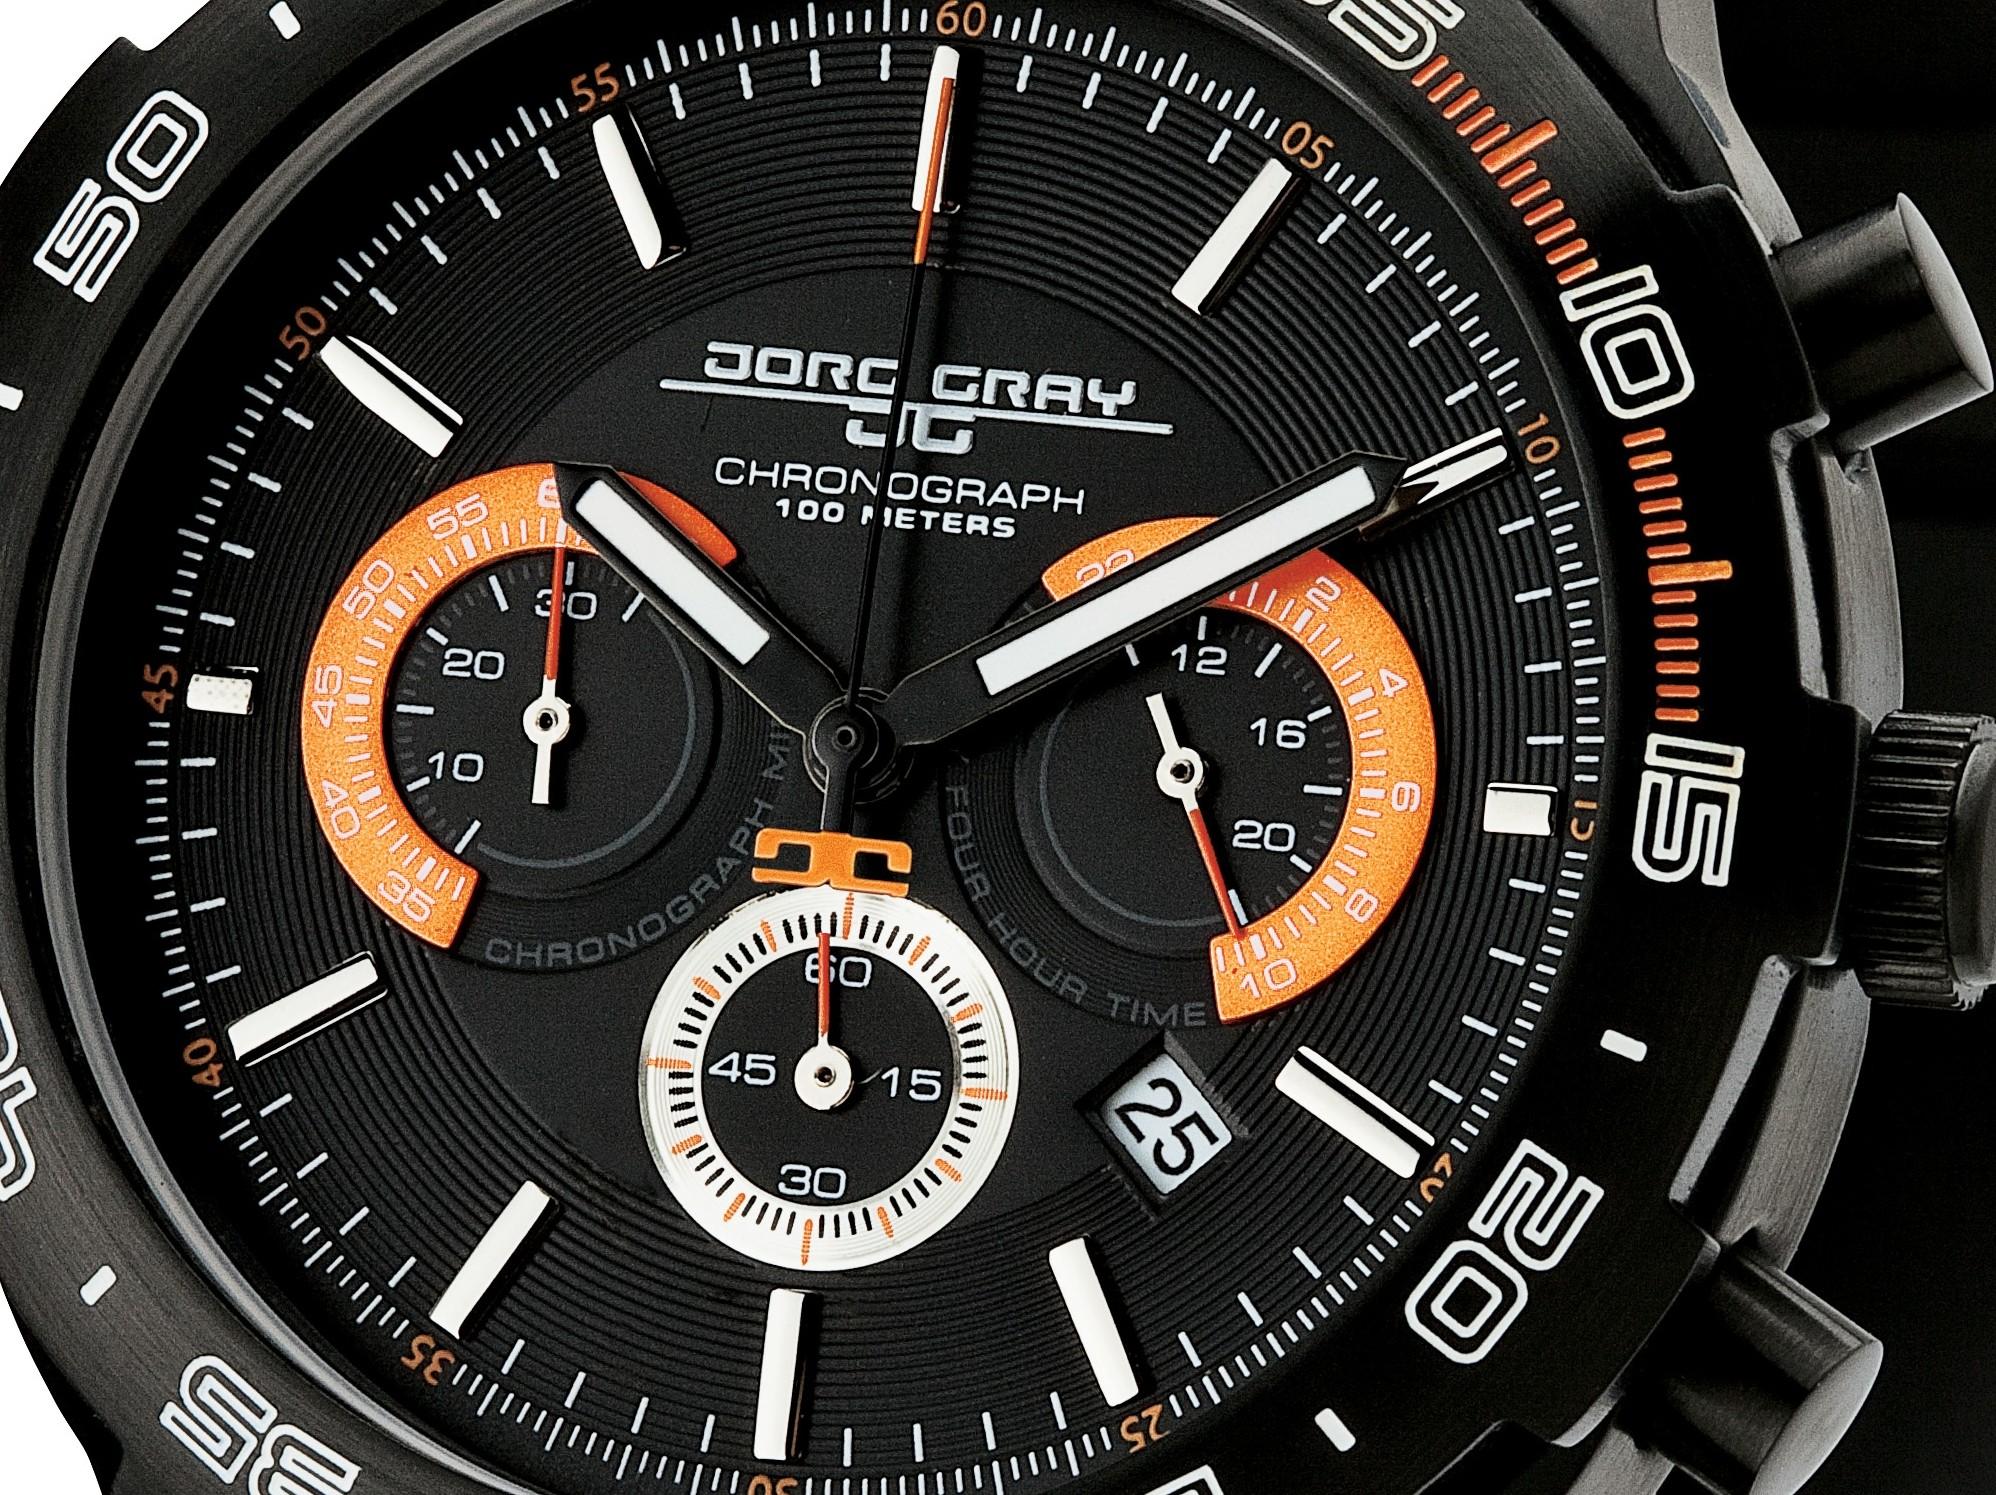 jorg gray watch